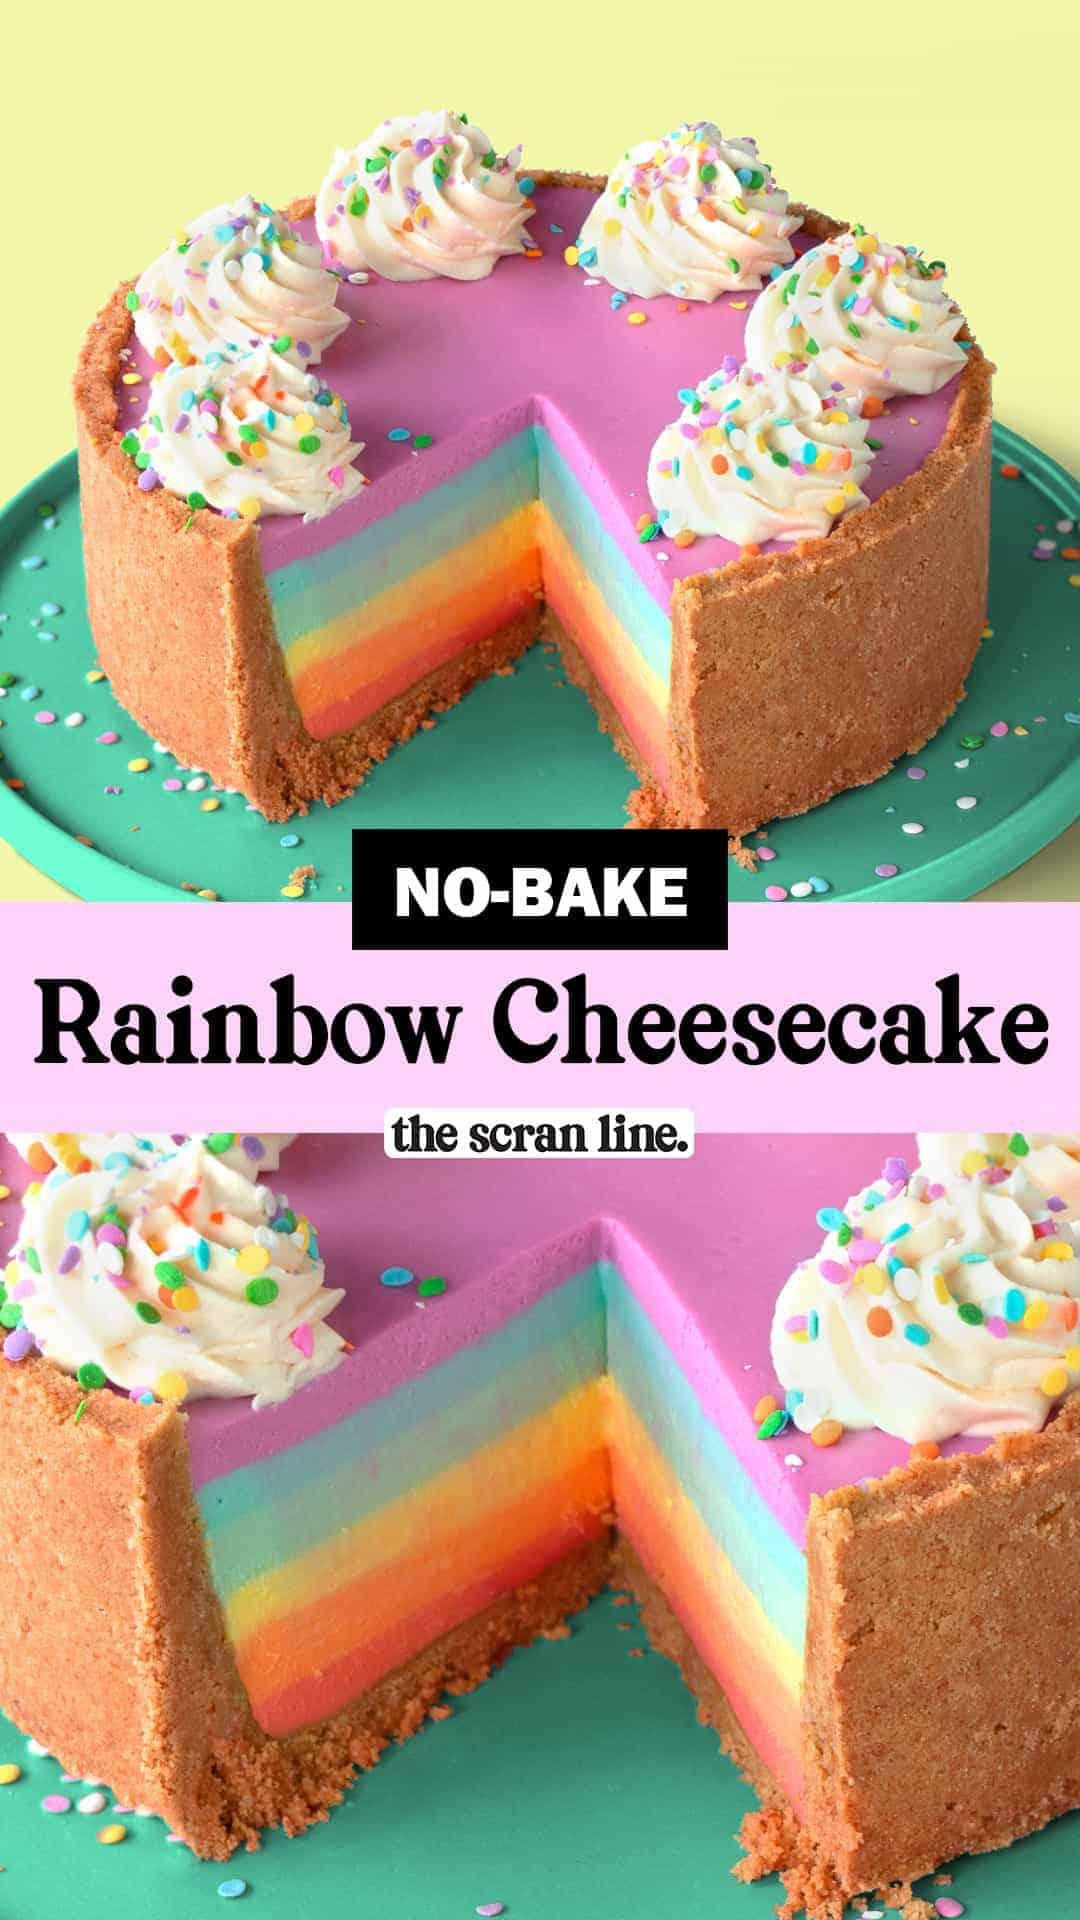 Pinterest Image For No-Bake Rainbow Cheesecake